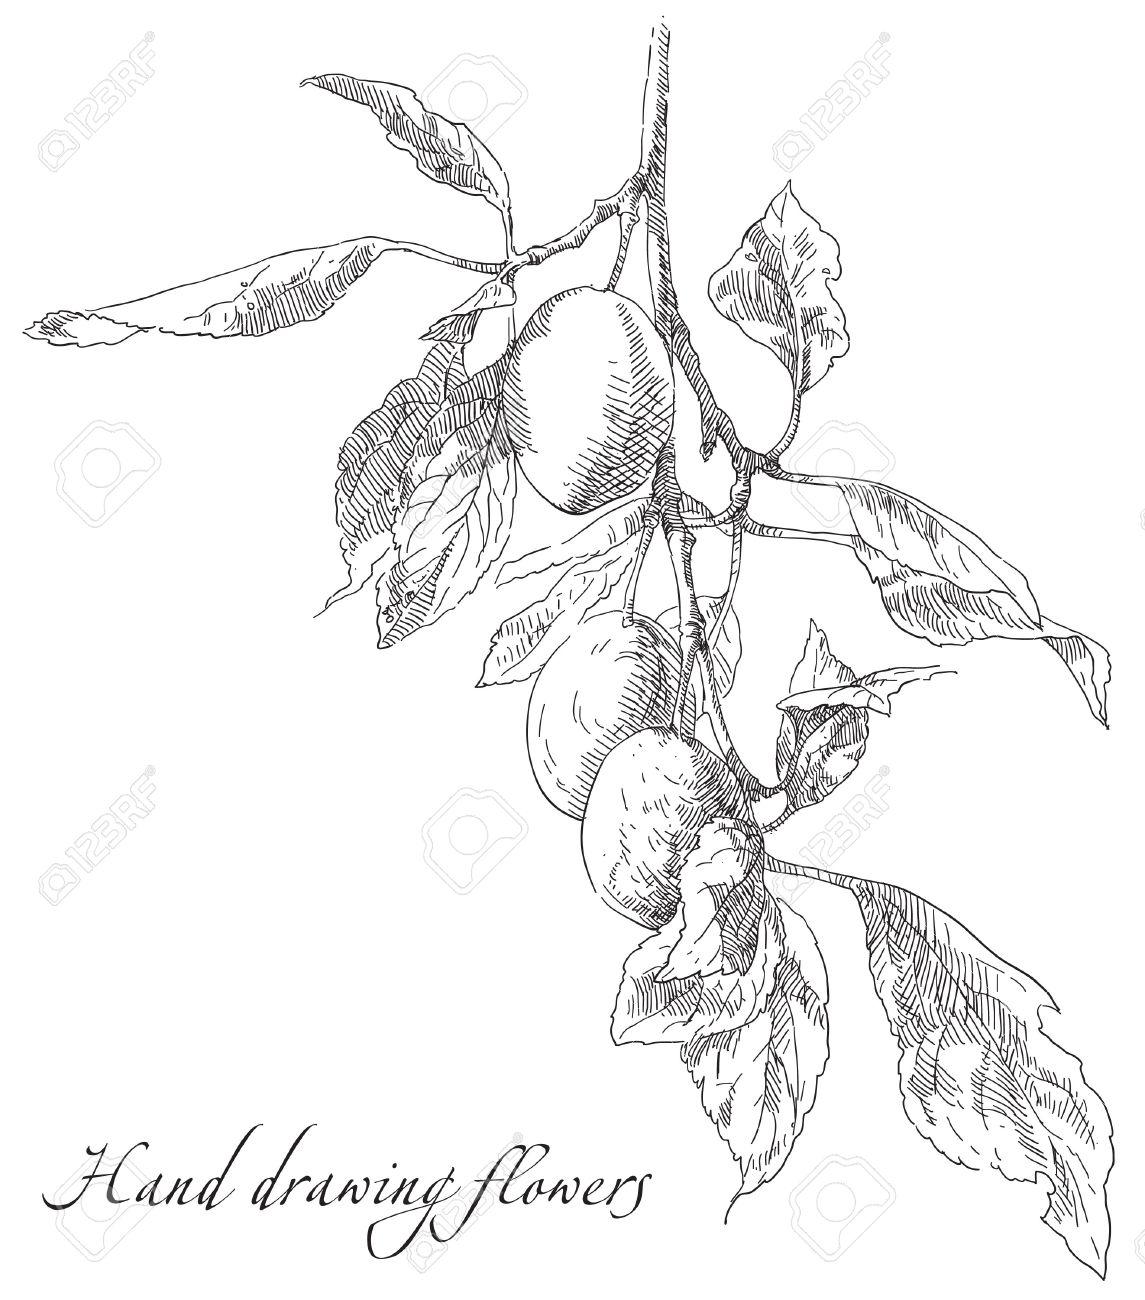 1145x1300 Hand Drawing Plum On Apple Tree Branch. Vector Illustration